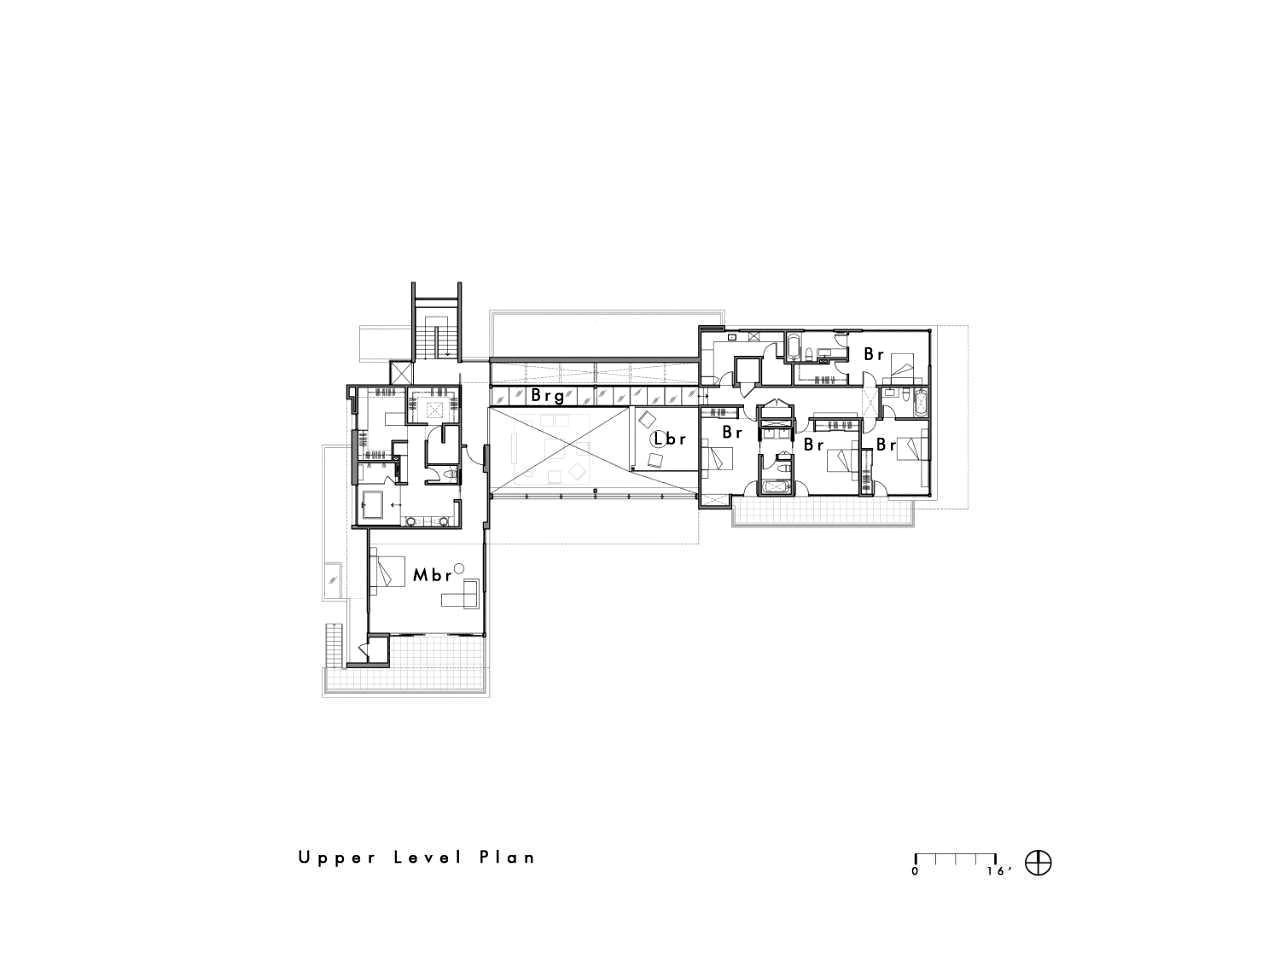 Upper Level Floor Plan – Modern Luxury OZ Residence – 92 Sutherland Drive, Atherton, CA, USA